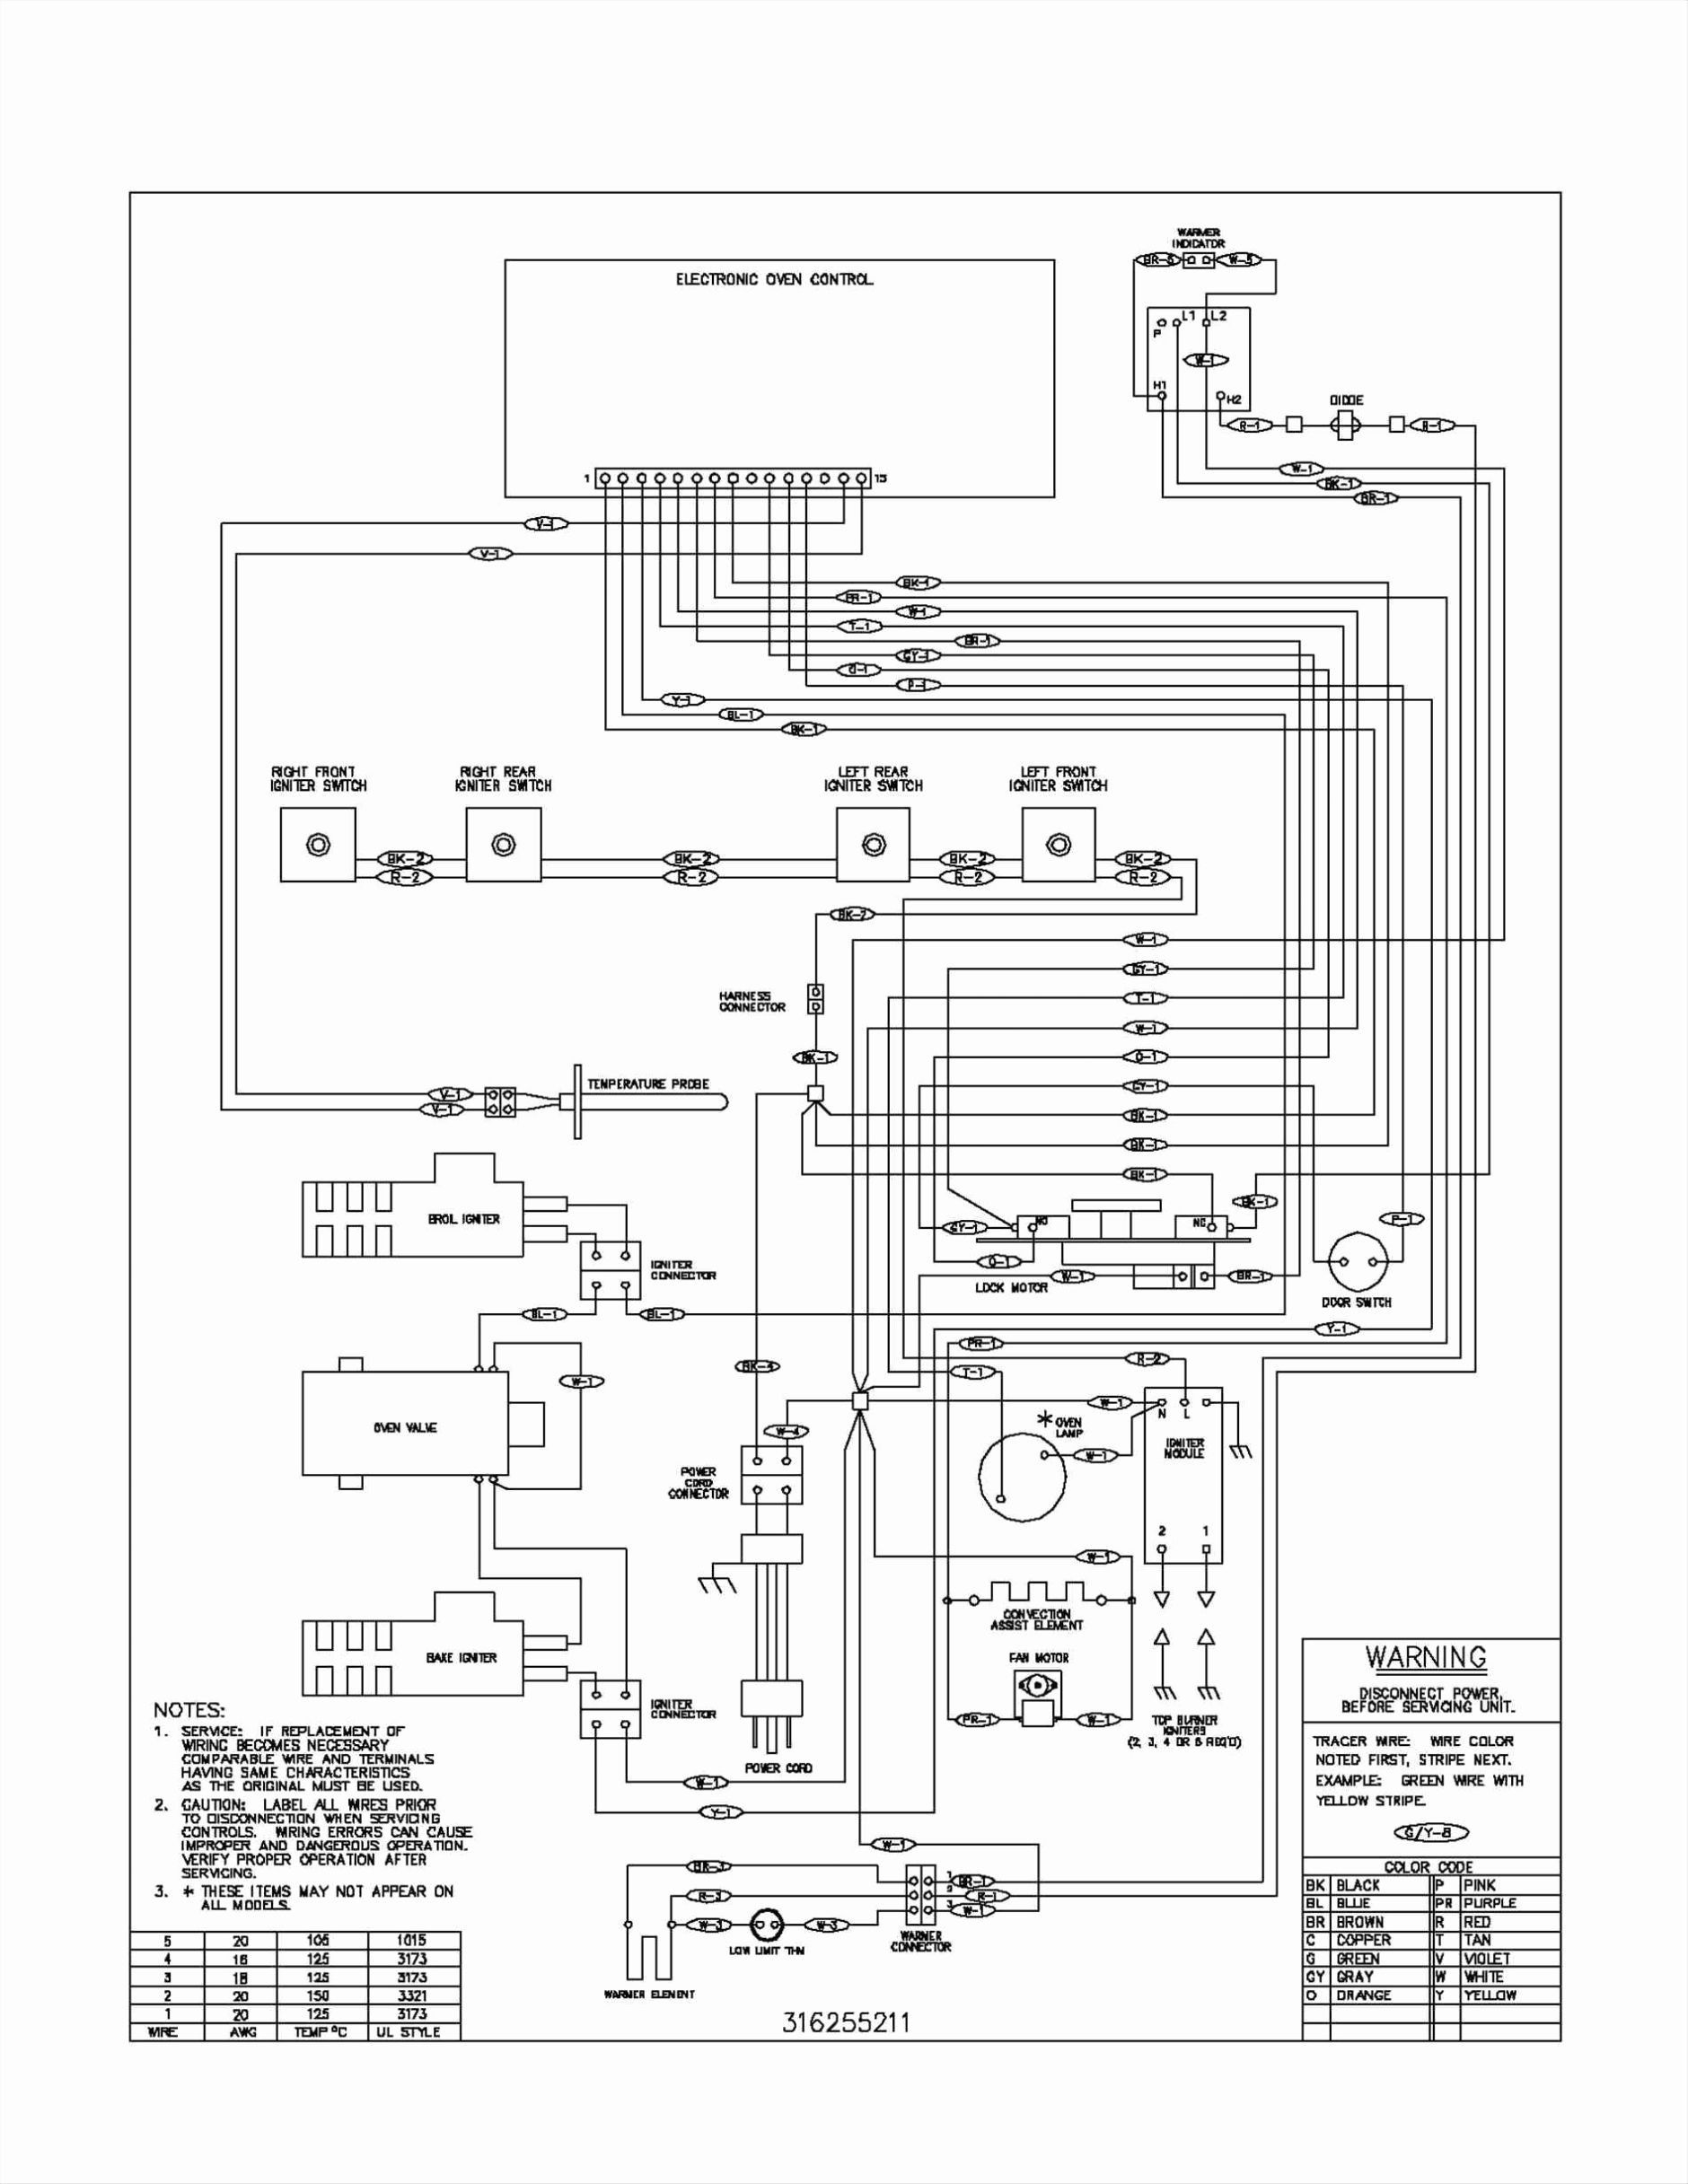 unique wiring diagram for 220 volt baseboard heater #diagram  #diagramtemplate #diagramsample